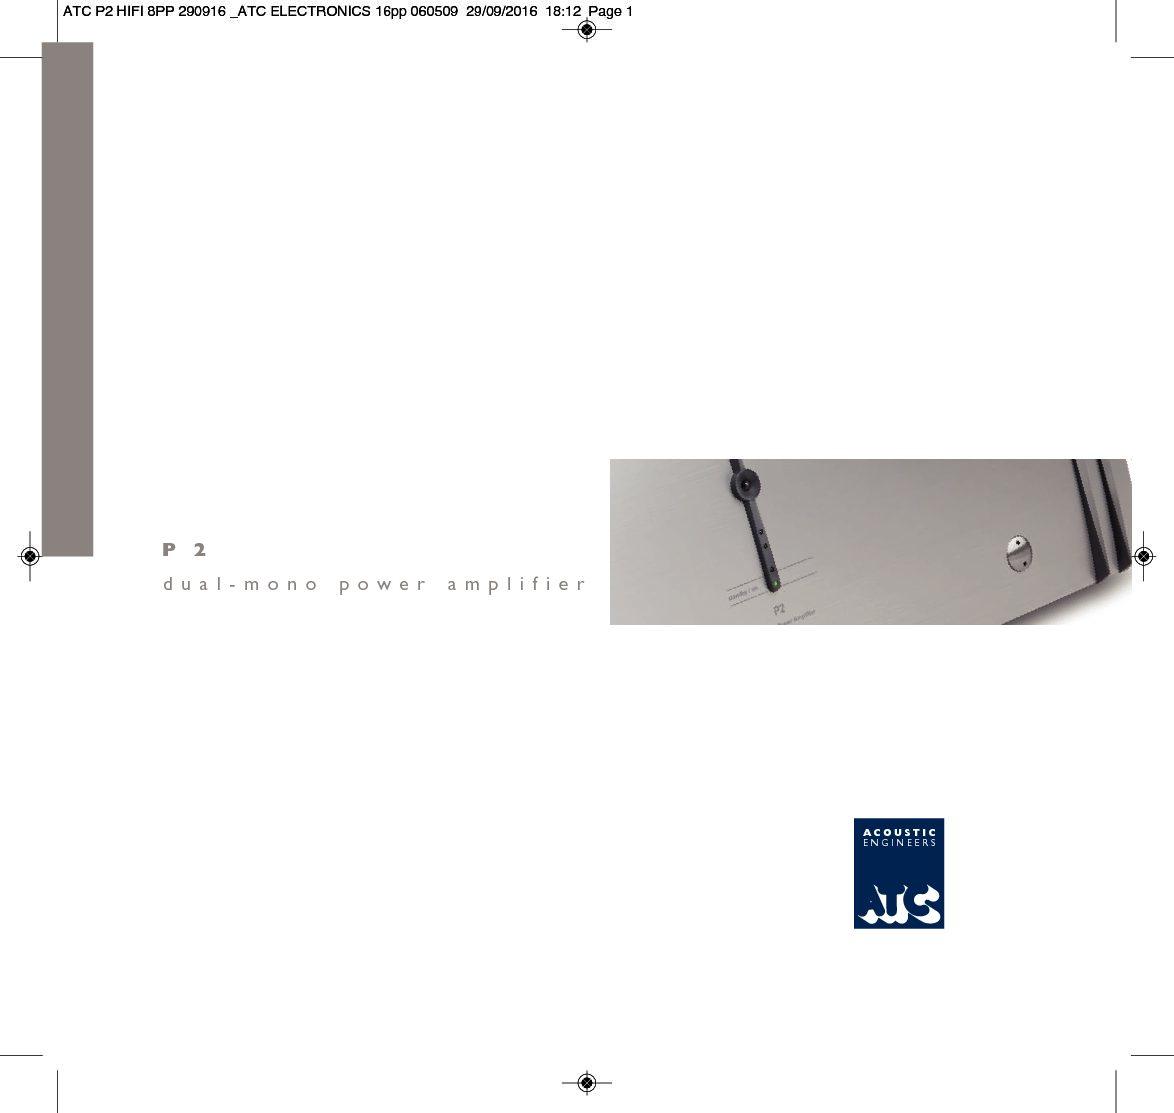 ATC P2 HIFI